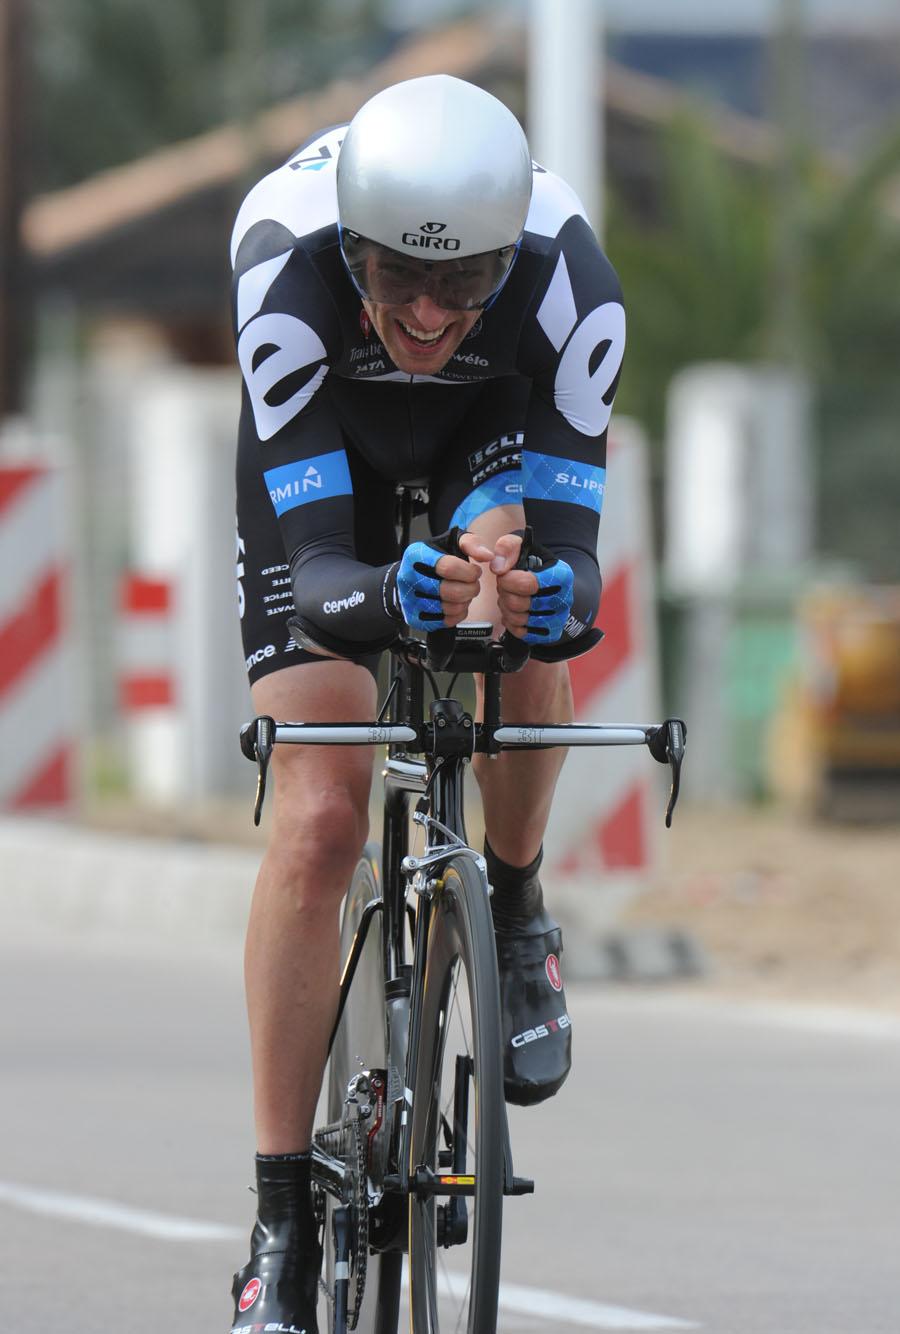 Ryder Hesjedal, Stage three time trial, Criterium International 2011